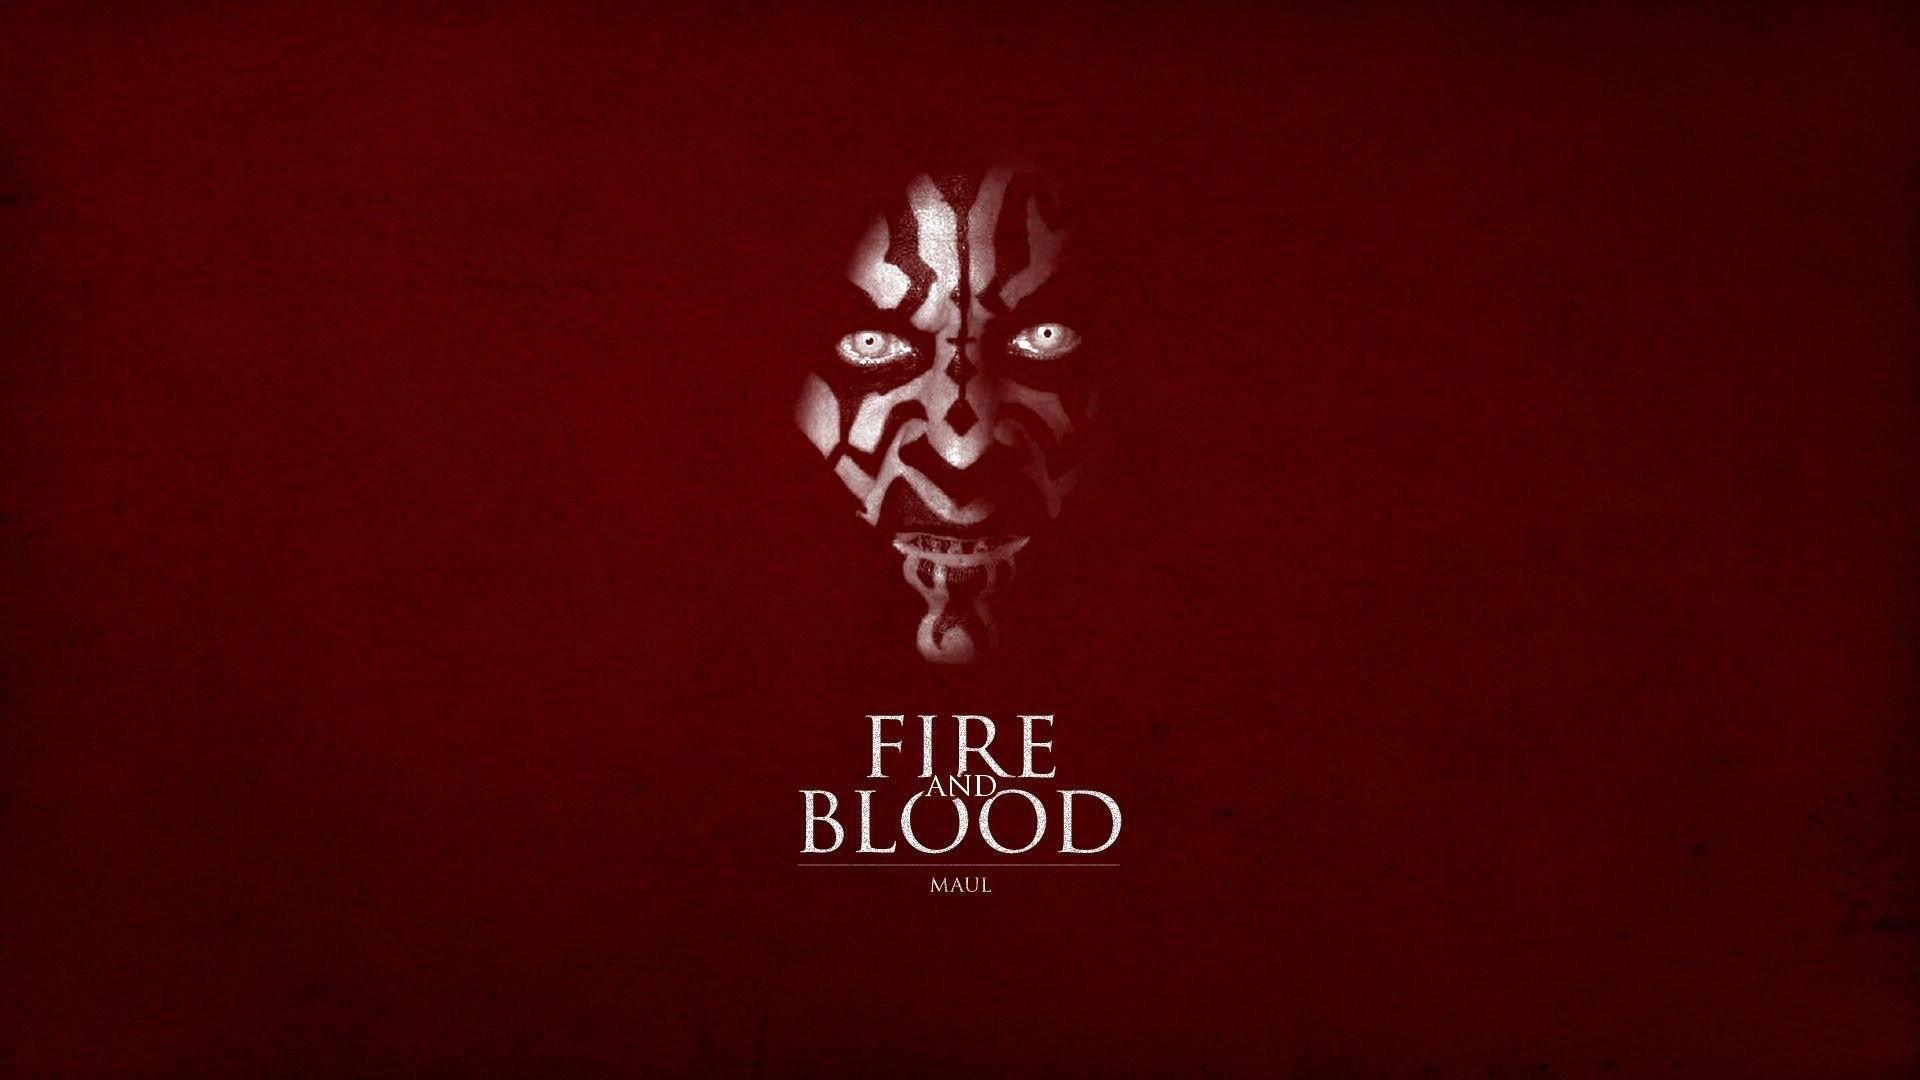 140 House Targaryen